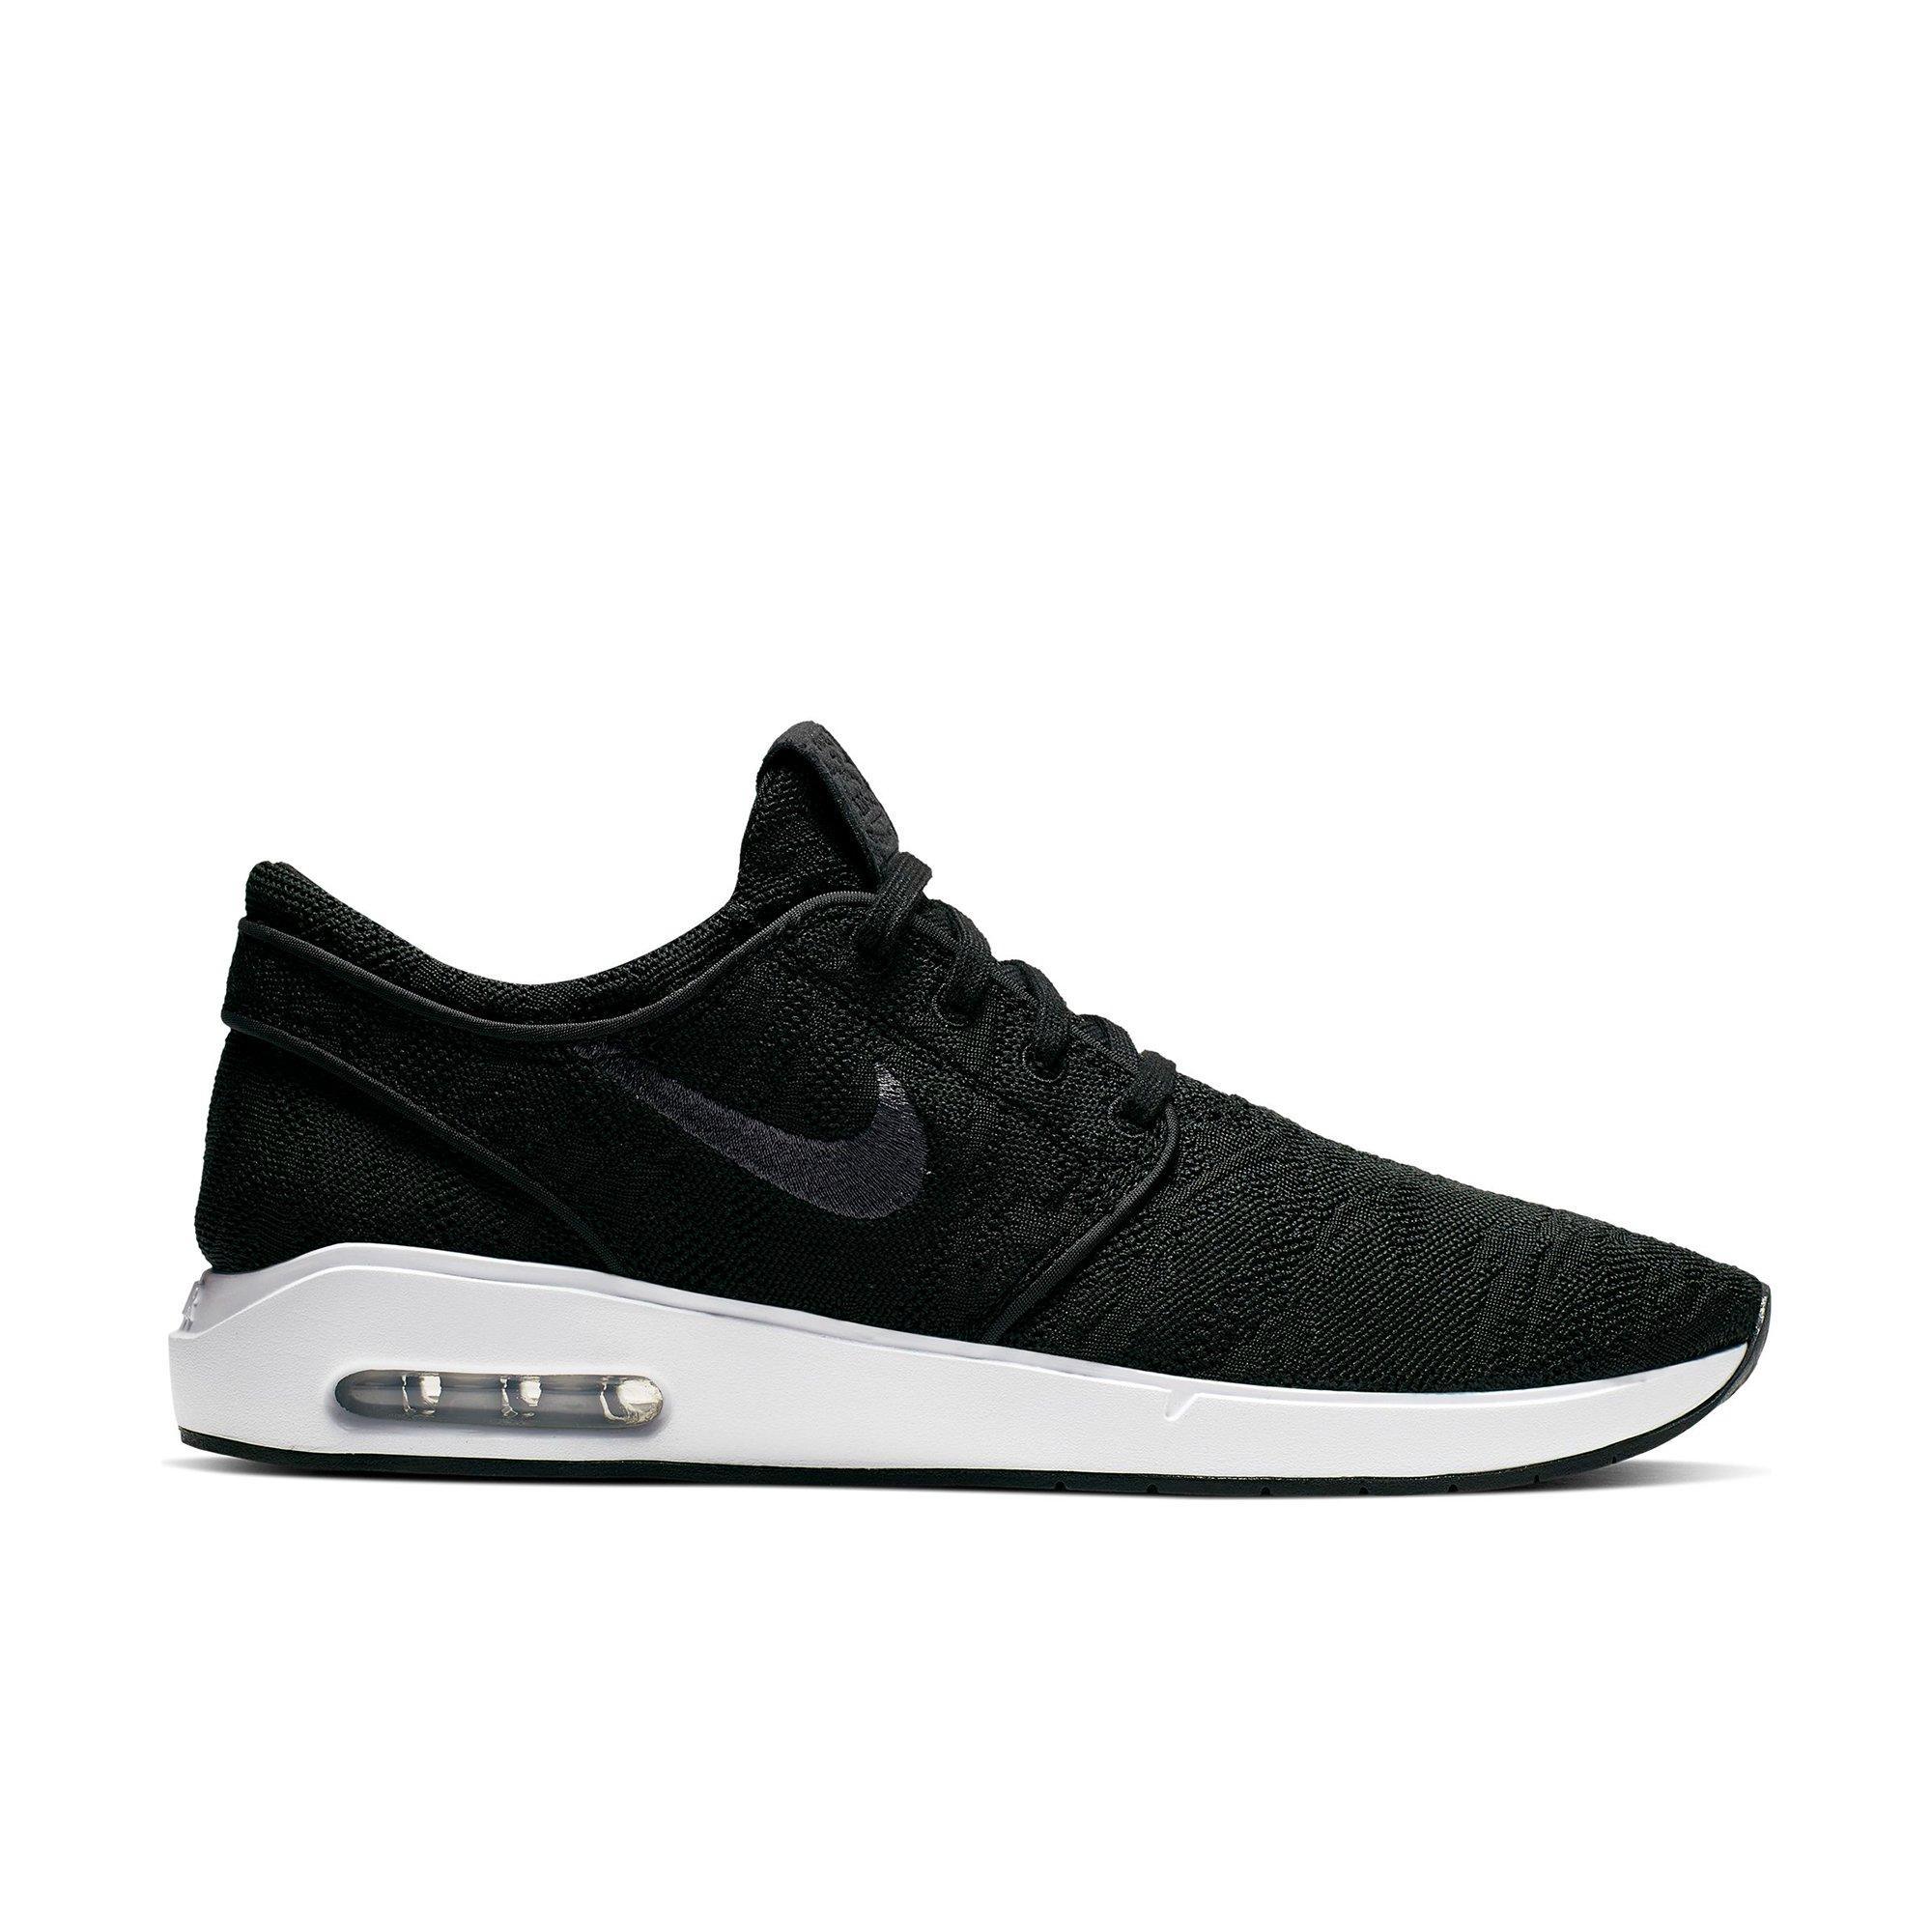 Perenne Distribución Surgir  Nike SB Air Max Stefan Janoski 2